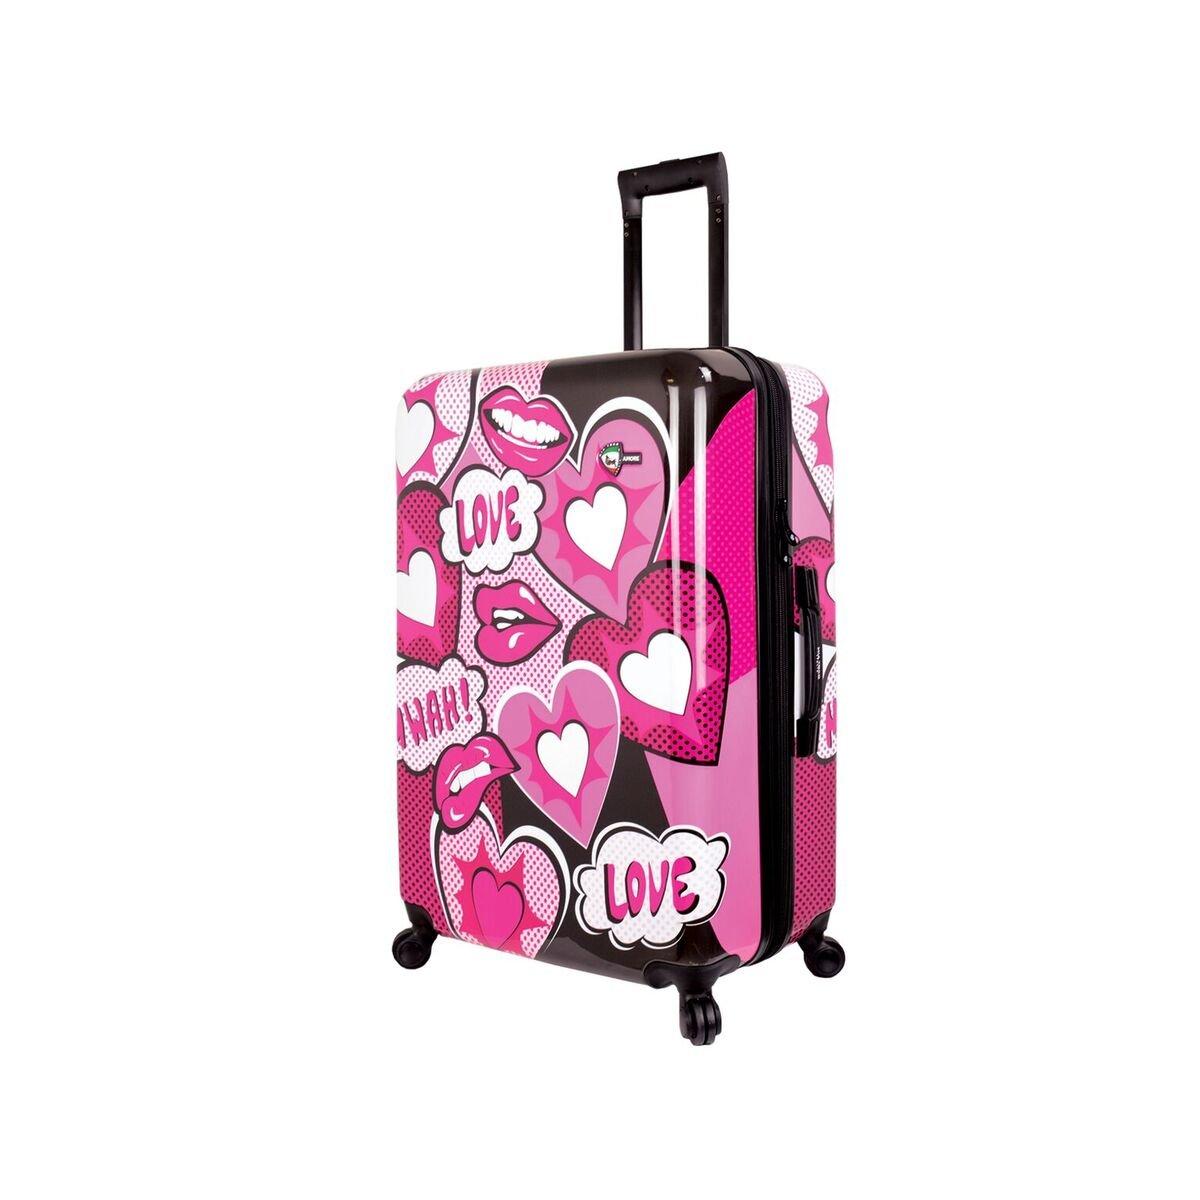 Mia Toro スーツケース, ピンク, One Size  ピンク B078SZQ461